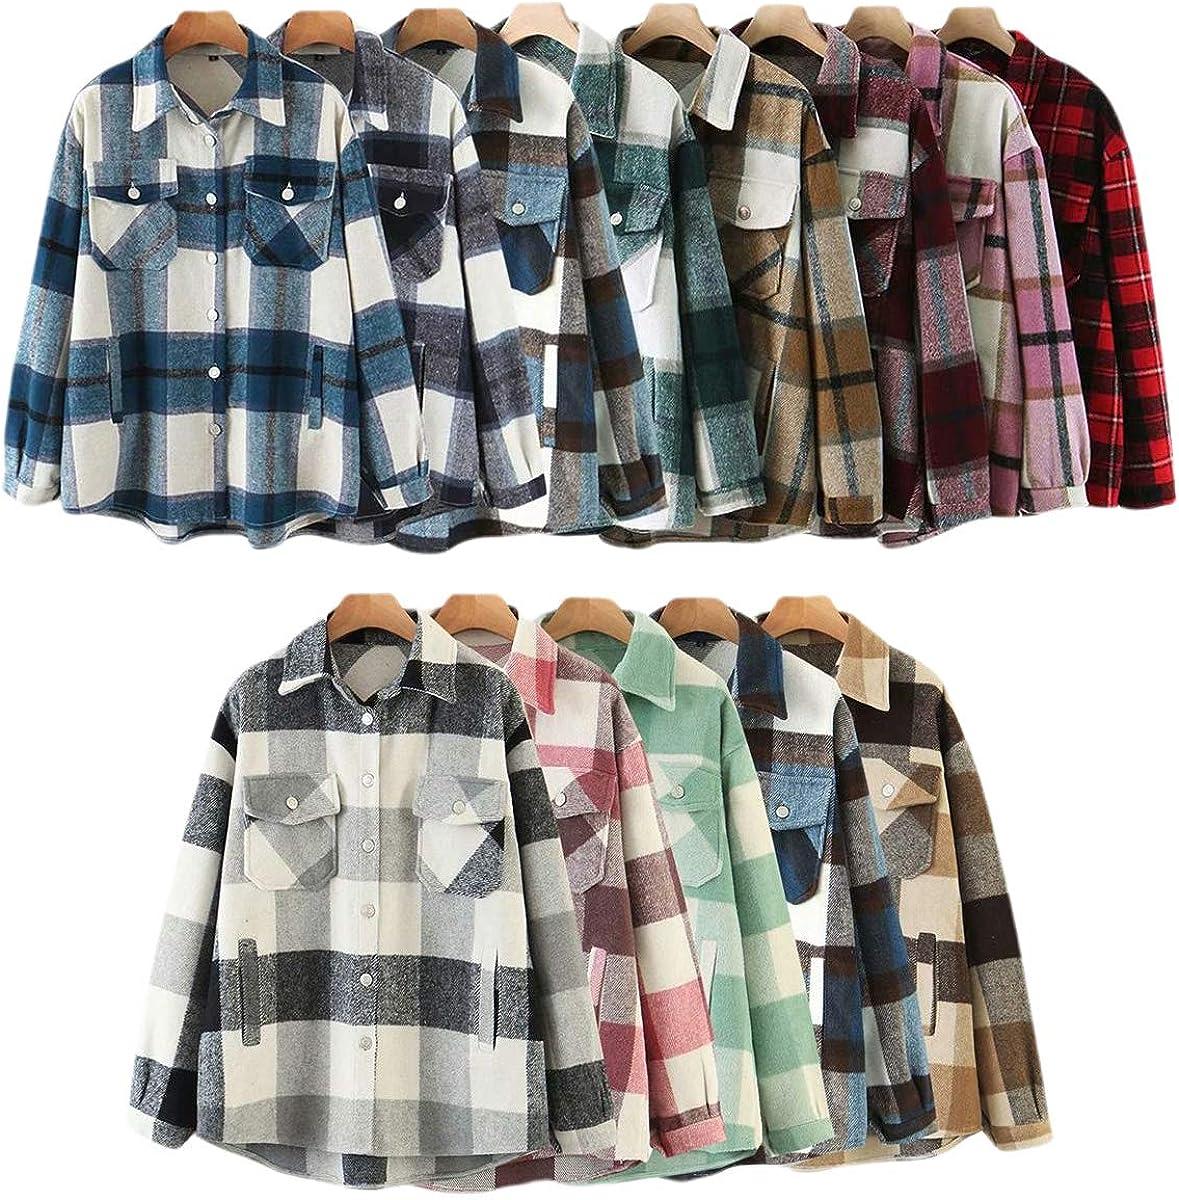 Excellent Women Plaid Long Sleeve Shirt Jacket Sale SALE% OFF Casual Button Blend Do Wool